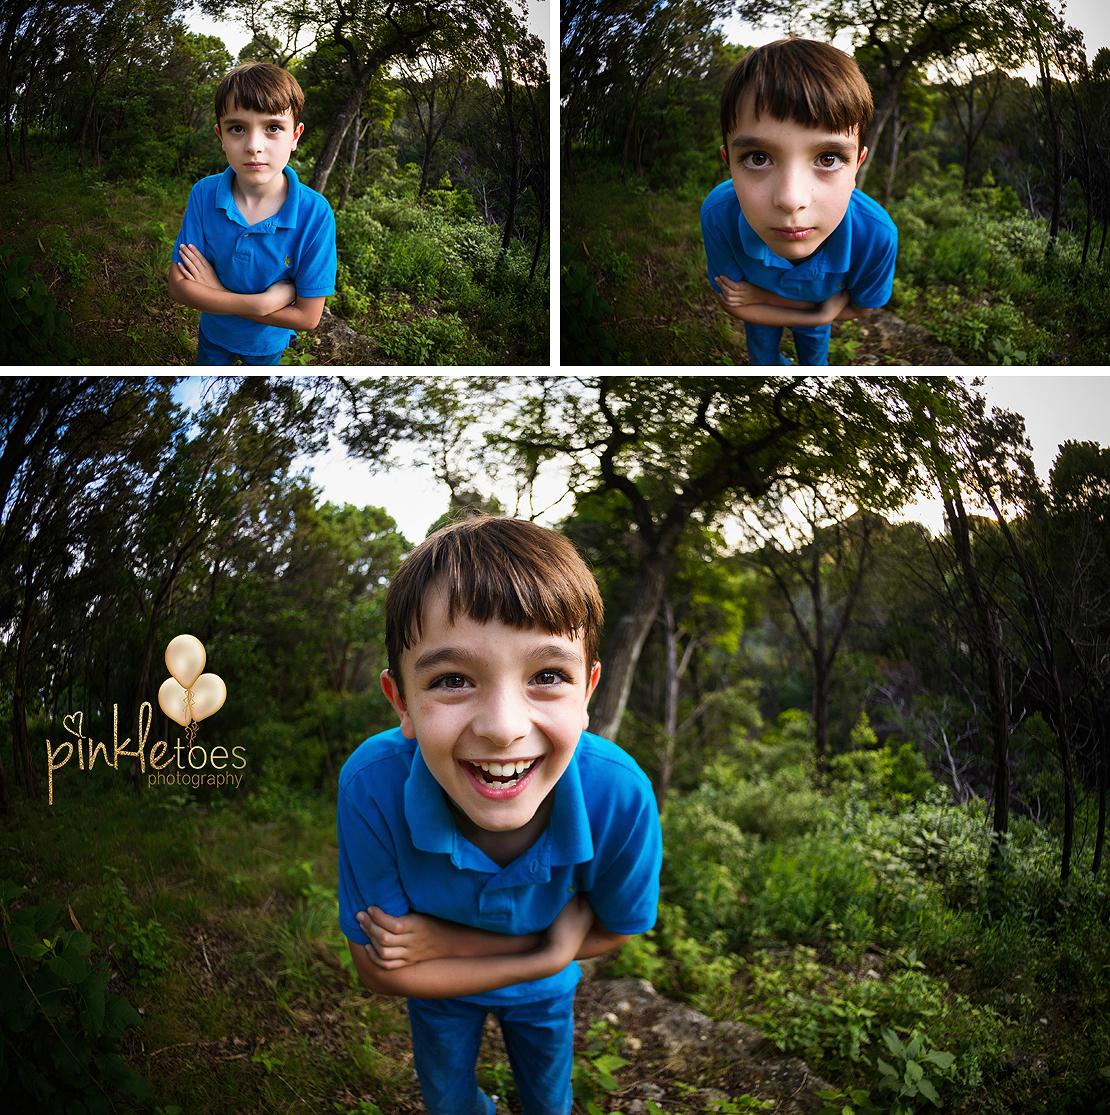 austin-kids-family-lifestyle-photography-home-dog-texas-019